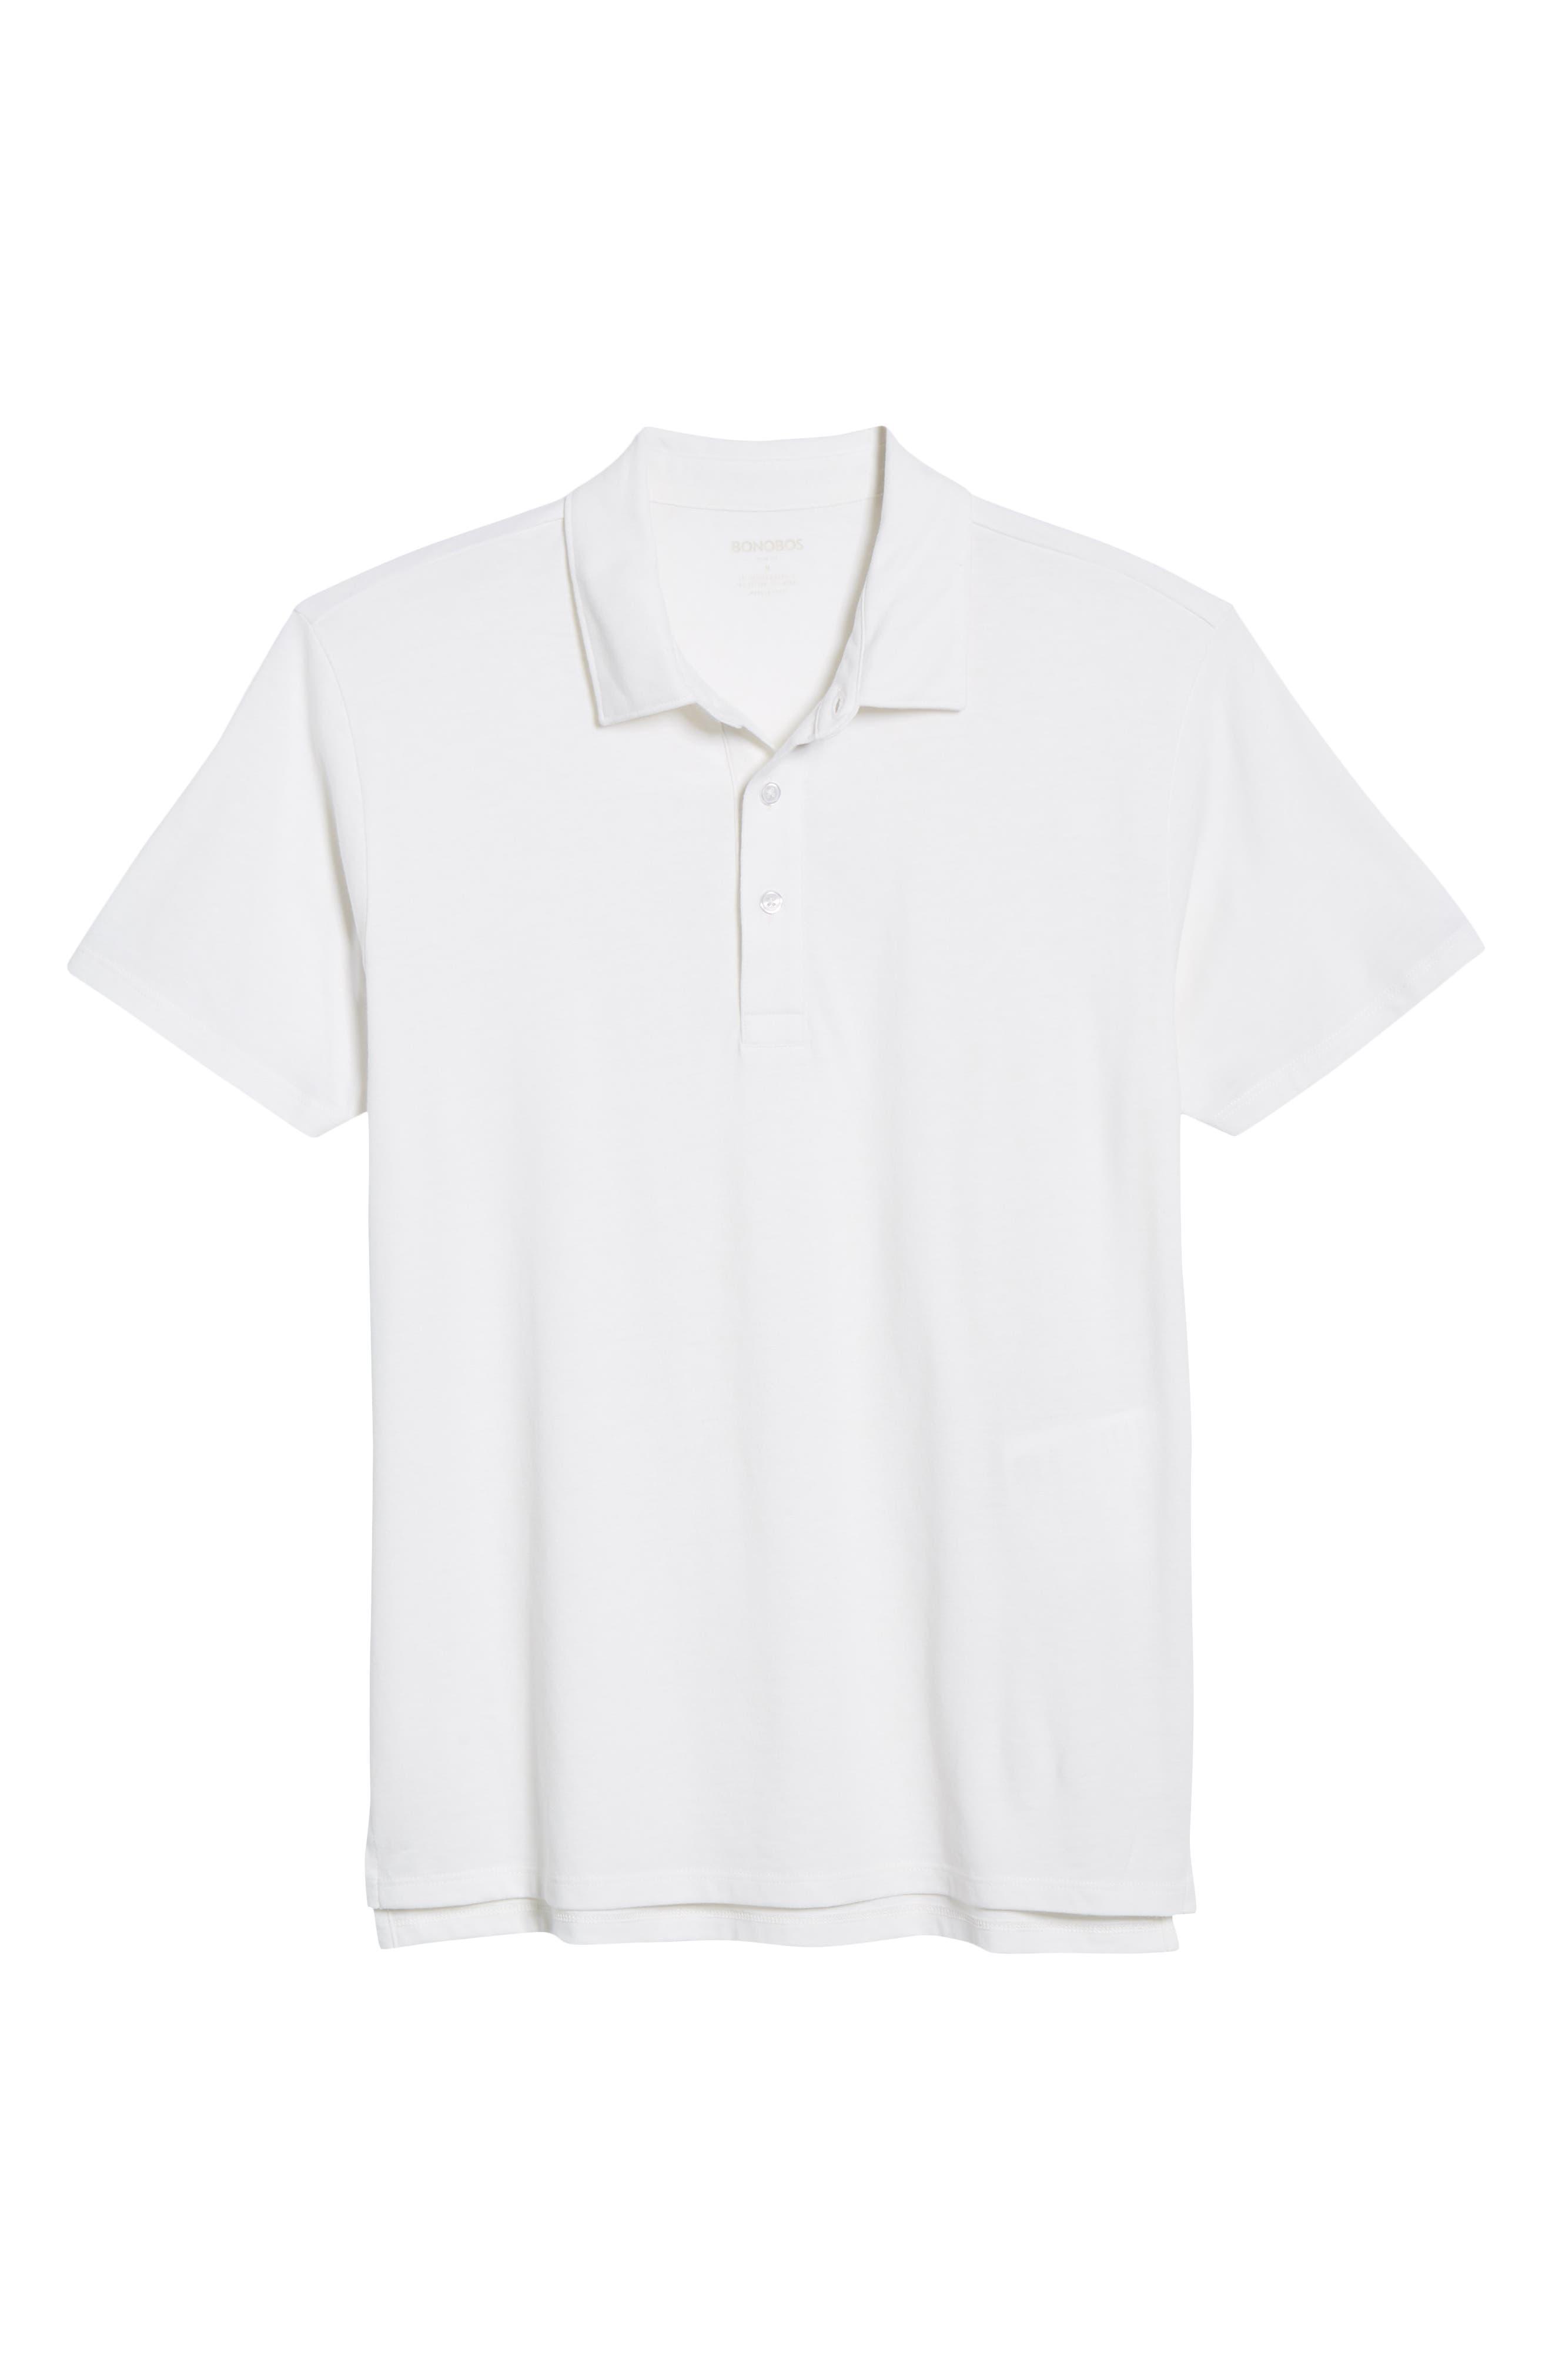 BONOBOS, Slim Fit Performance Polo, Alternate thumbnail 6, color, BRIGHT WHITE